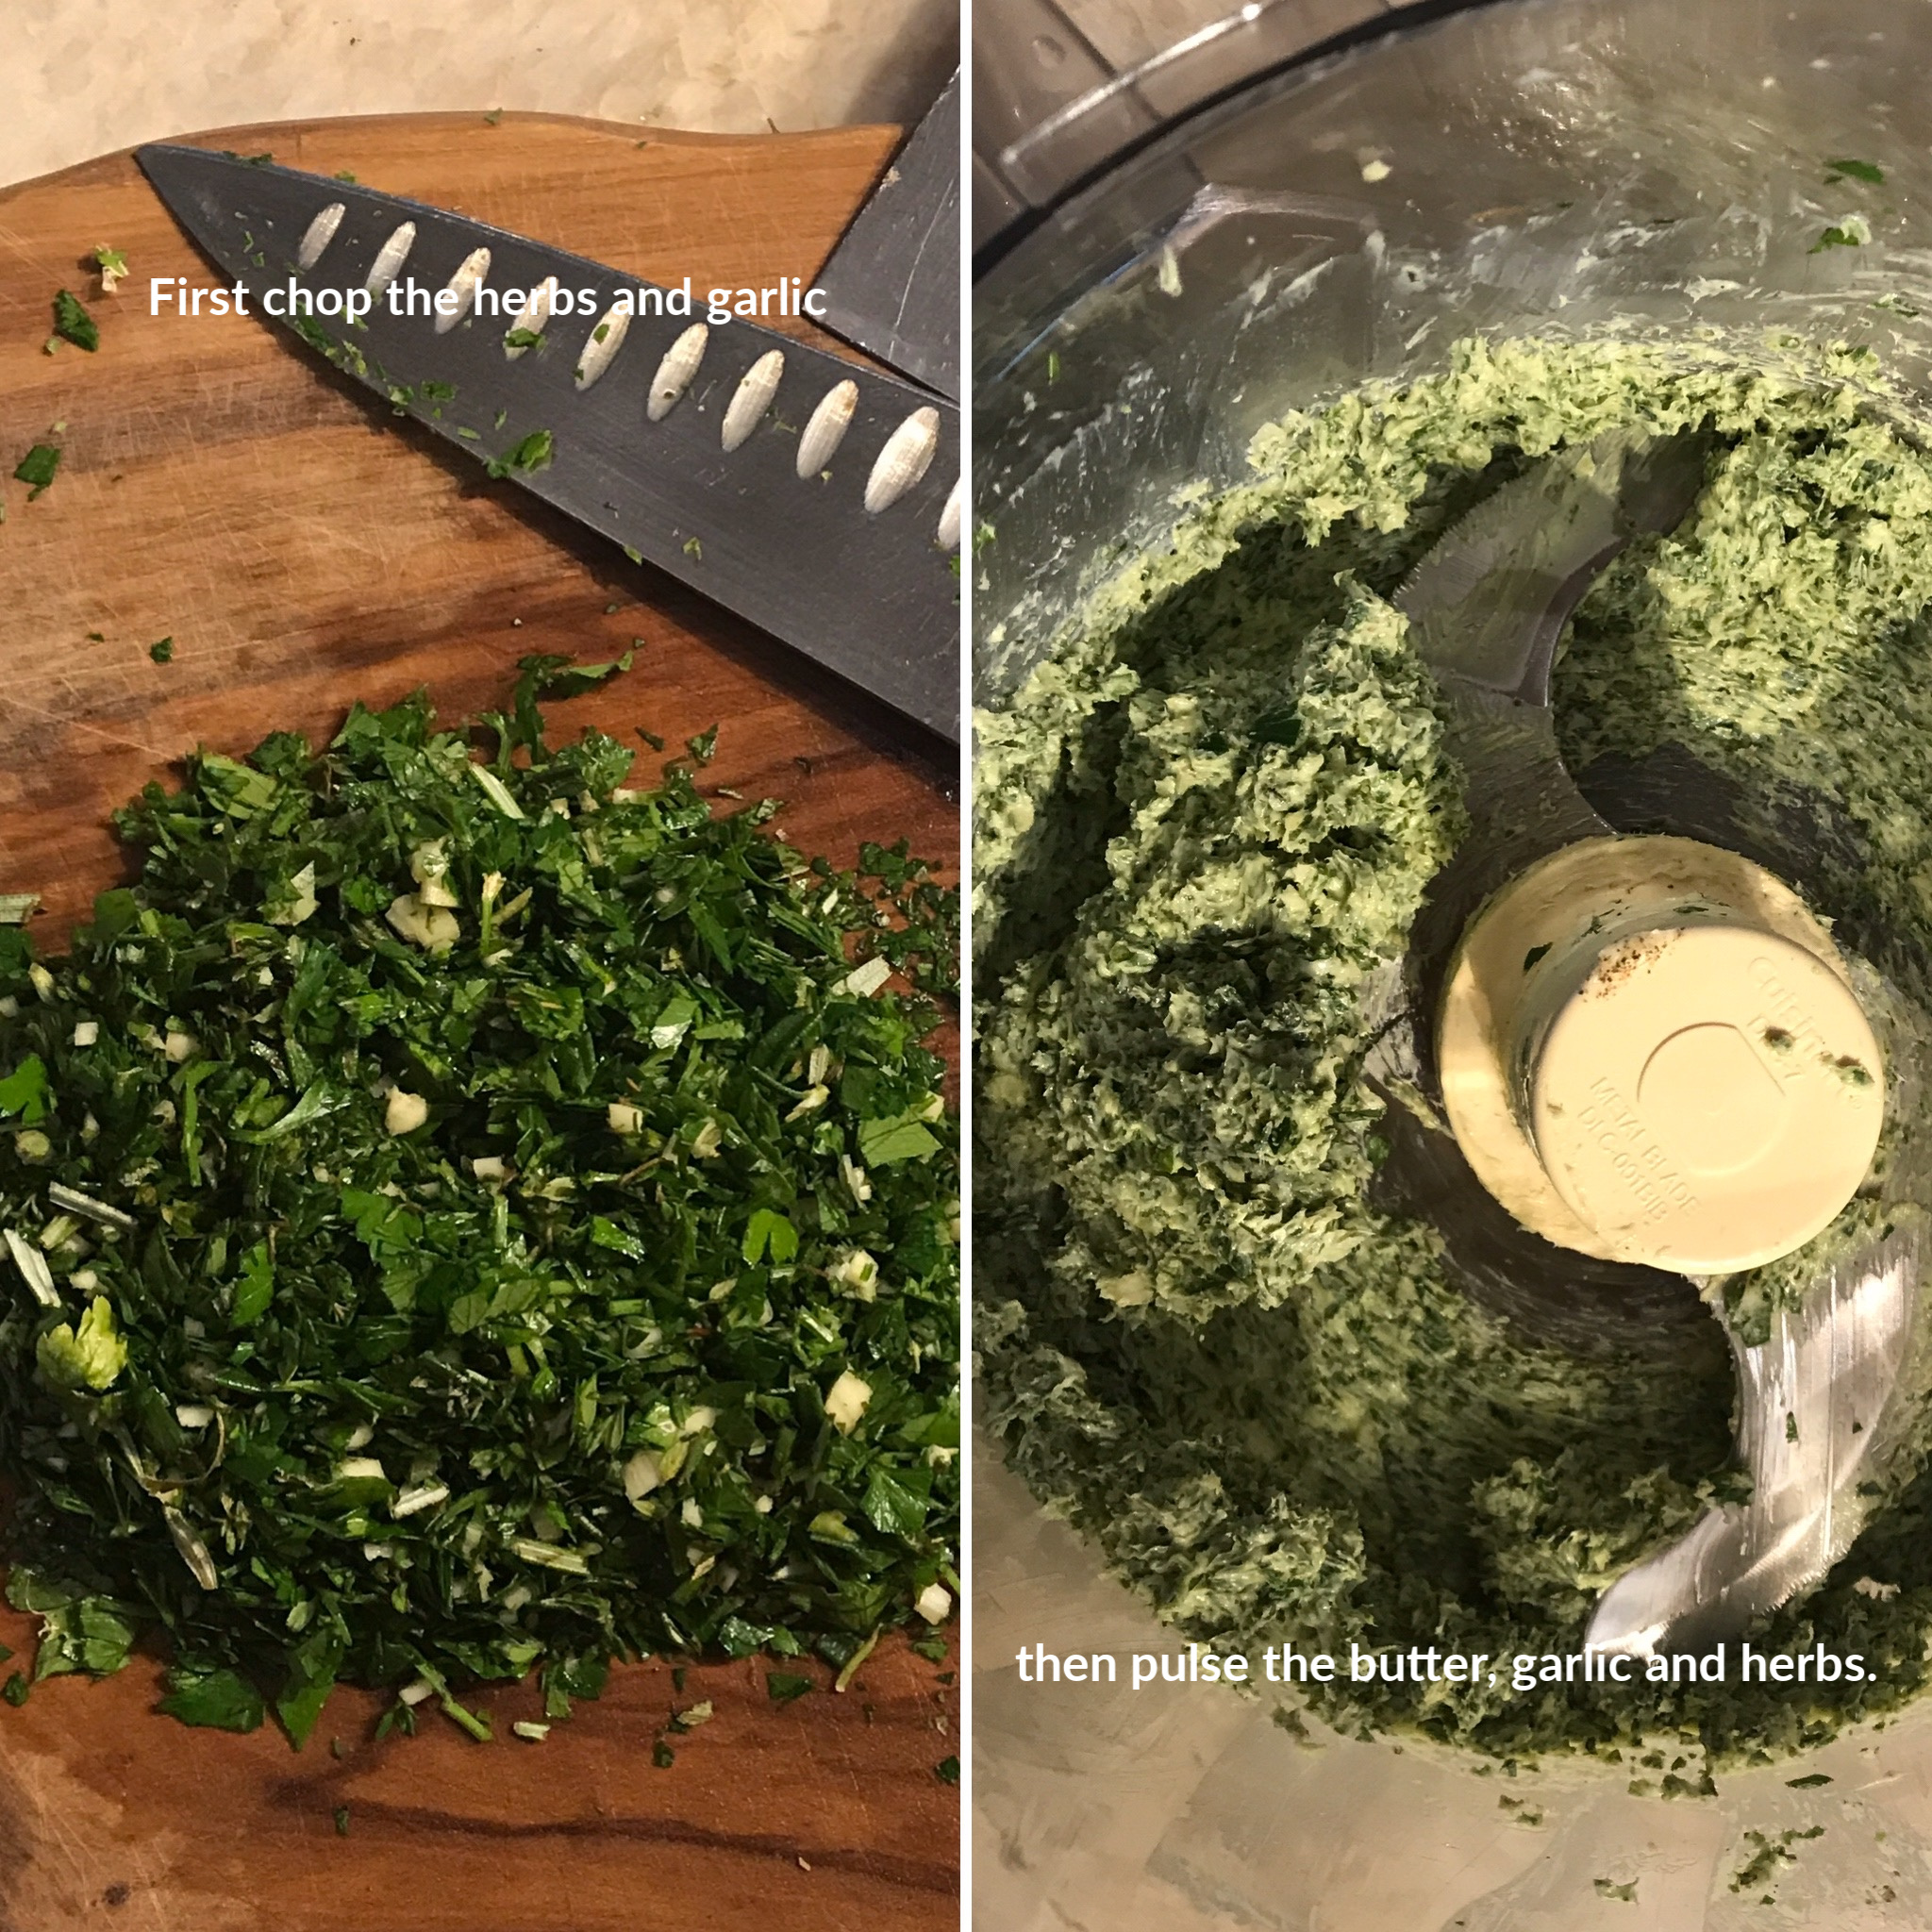 Preparing the garlic herb butter.